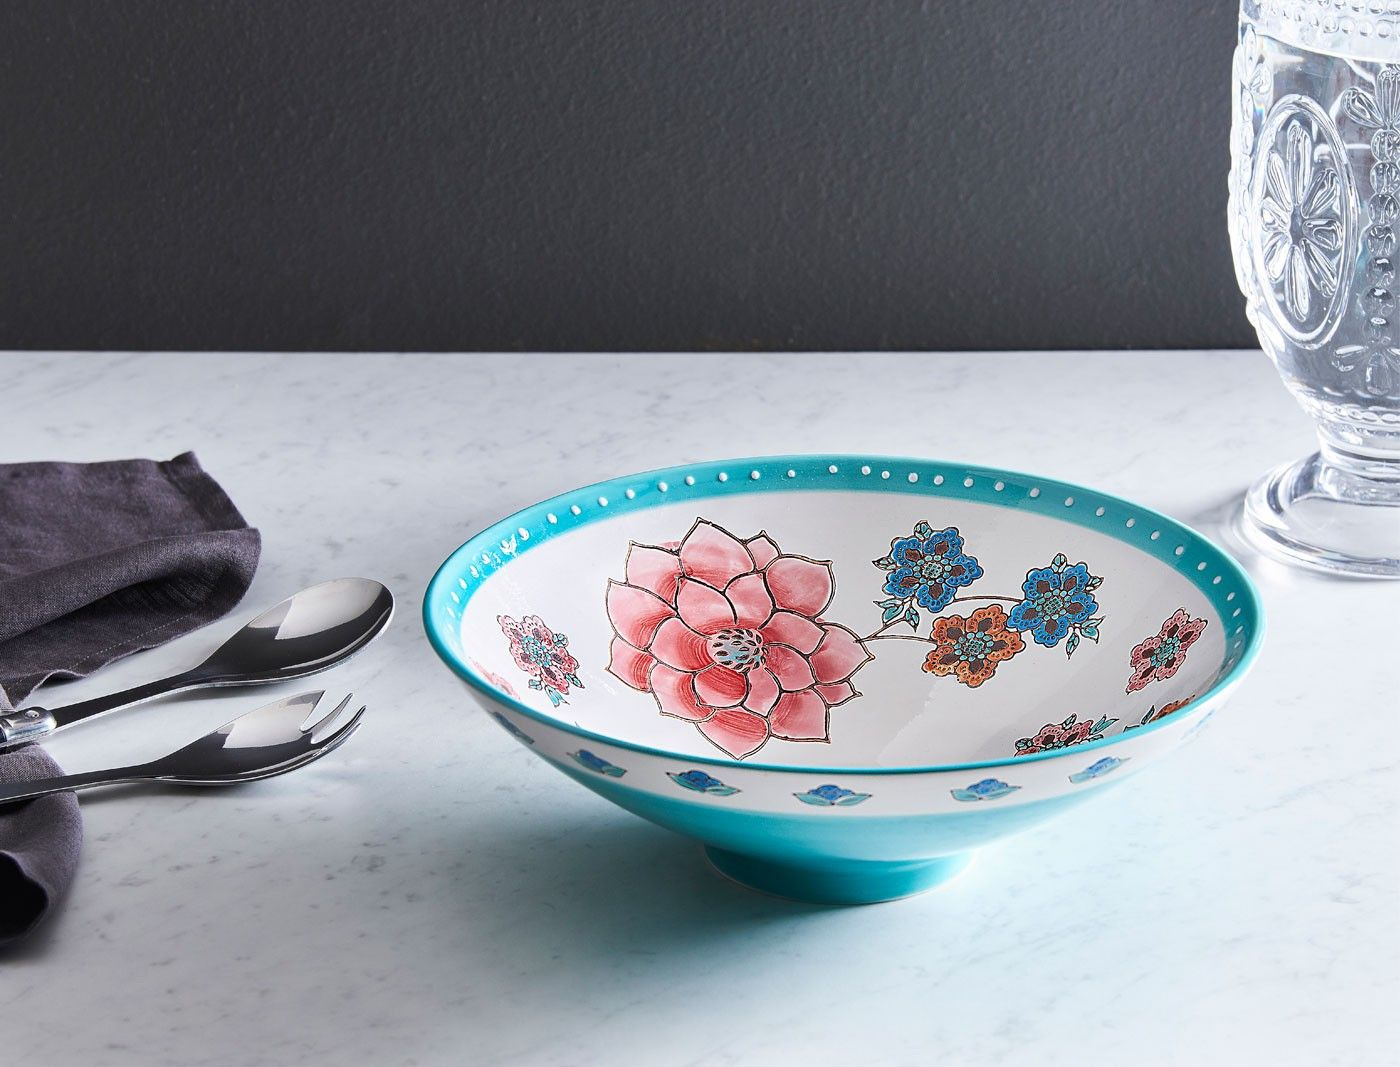 Florentino Tango Tango Flared Bowl Floral Pink Aqua Bowl Everyday Essentials Products Decorative Bowls